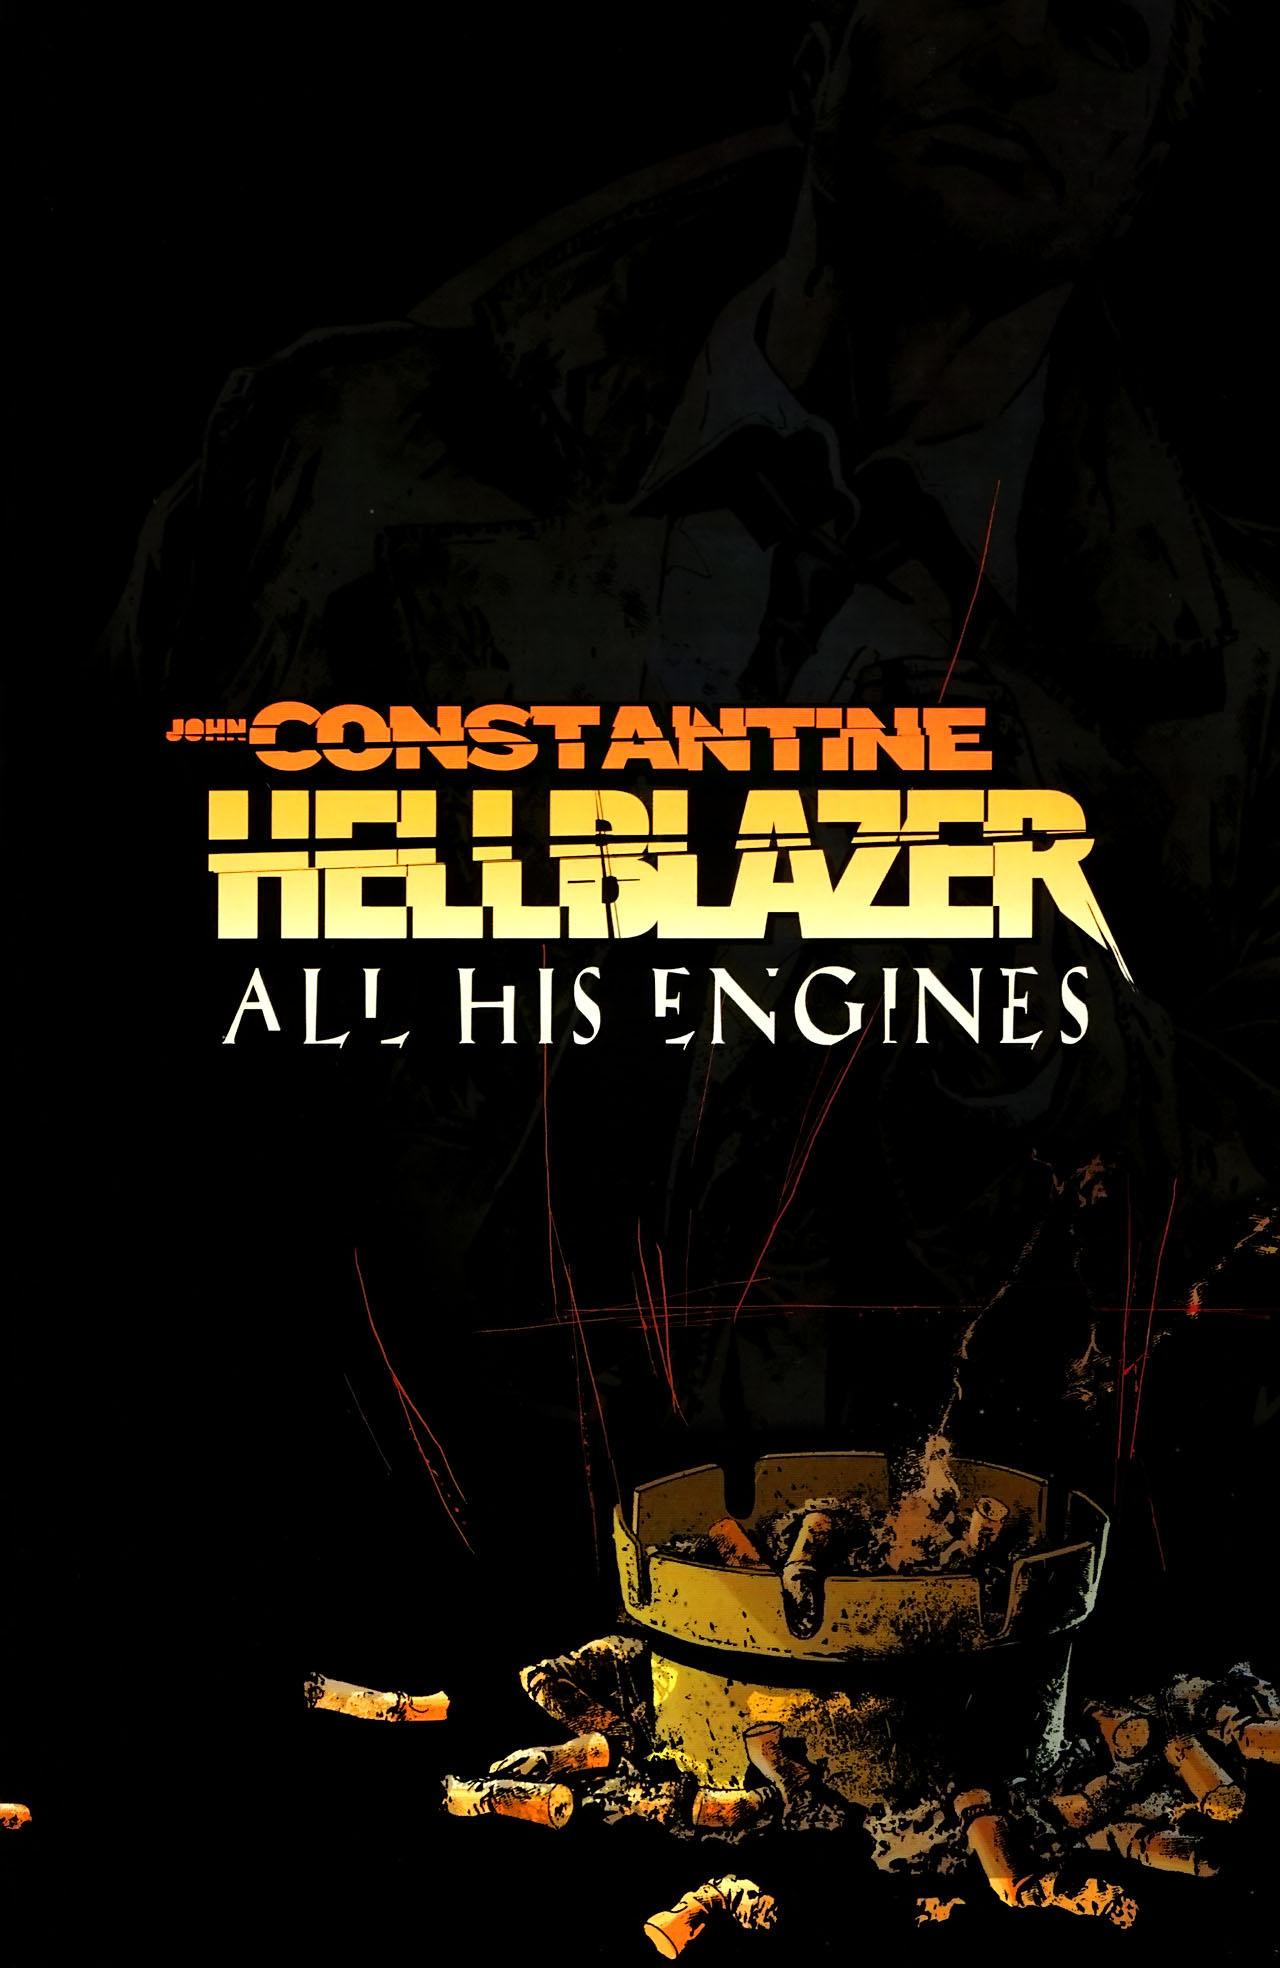 Read online John Constantine Hellblazer: All His Engines comic -  Issue # Full - 5